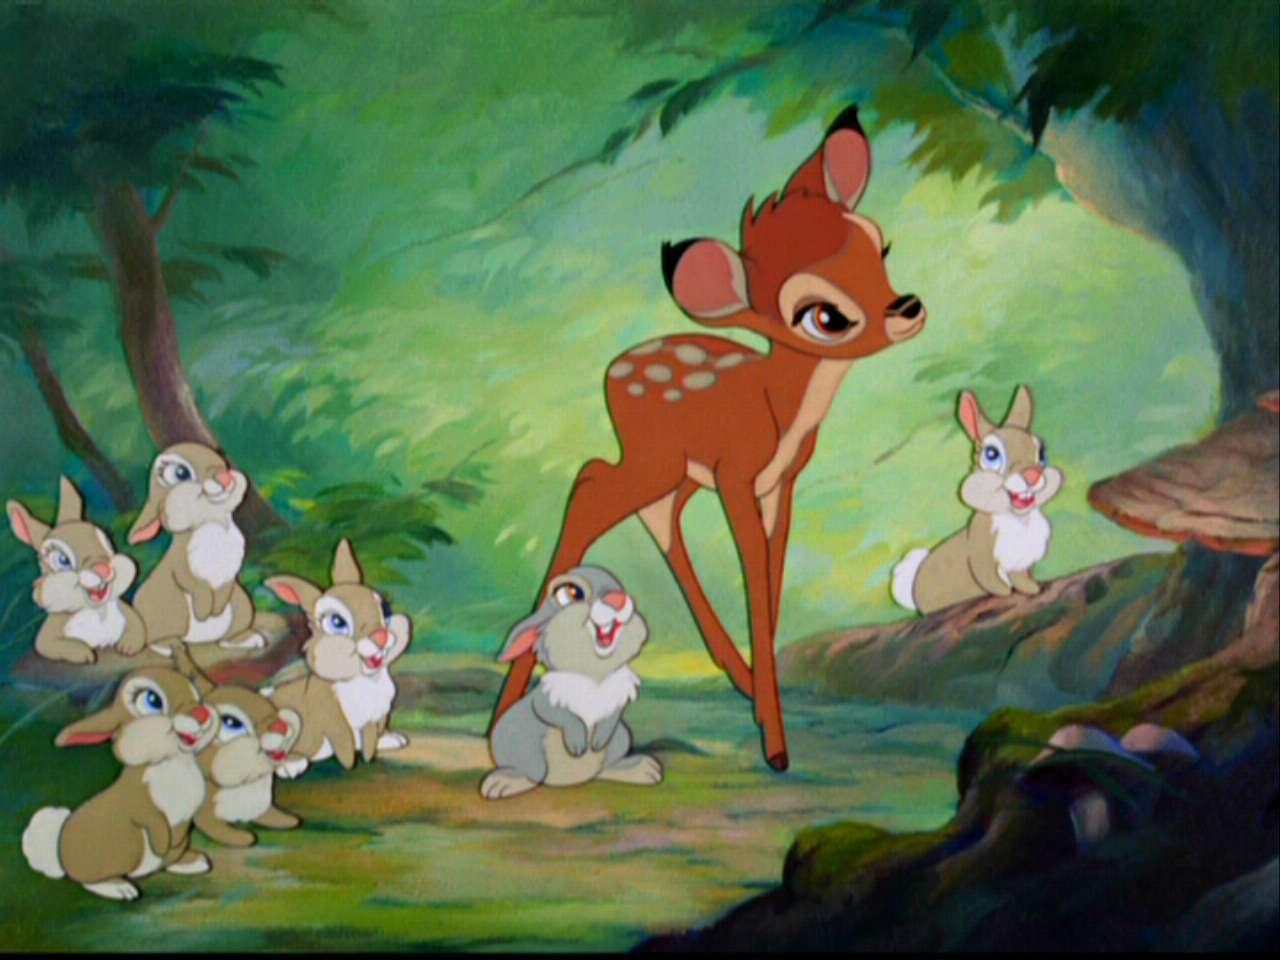 bambi wallpapers wallpaper cave